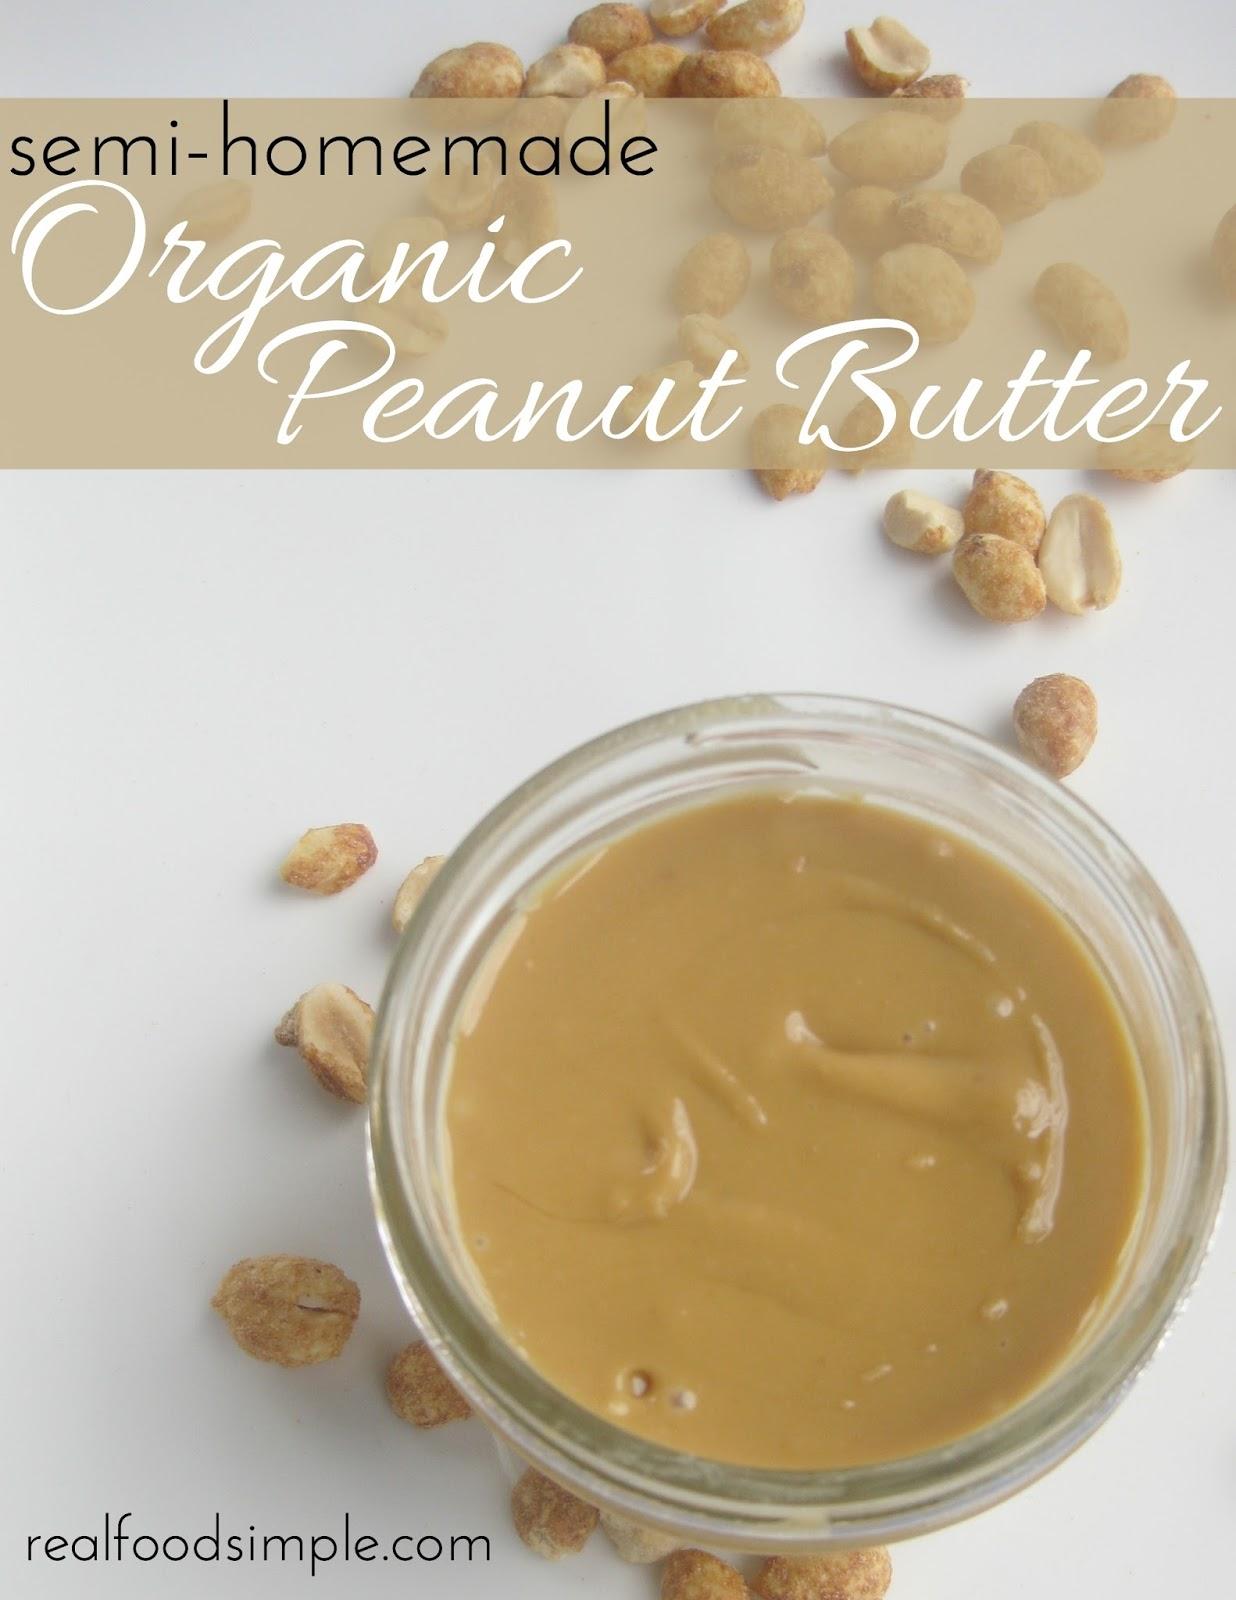 semi homemade organic peanut butter | realfoodsimple.com